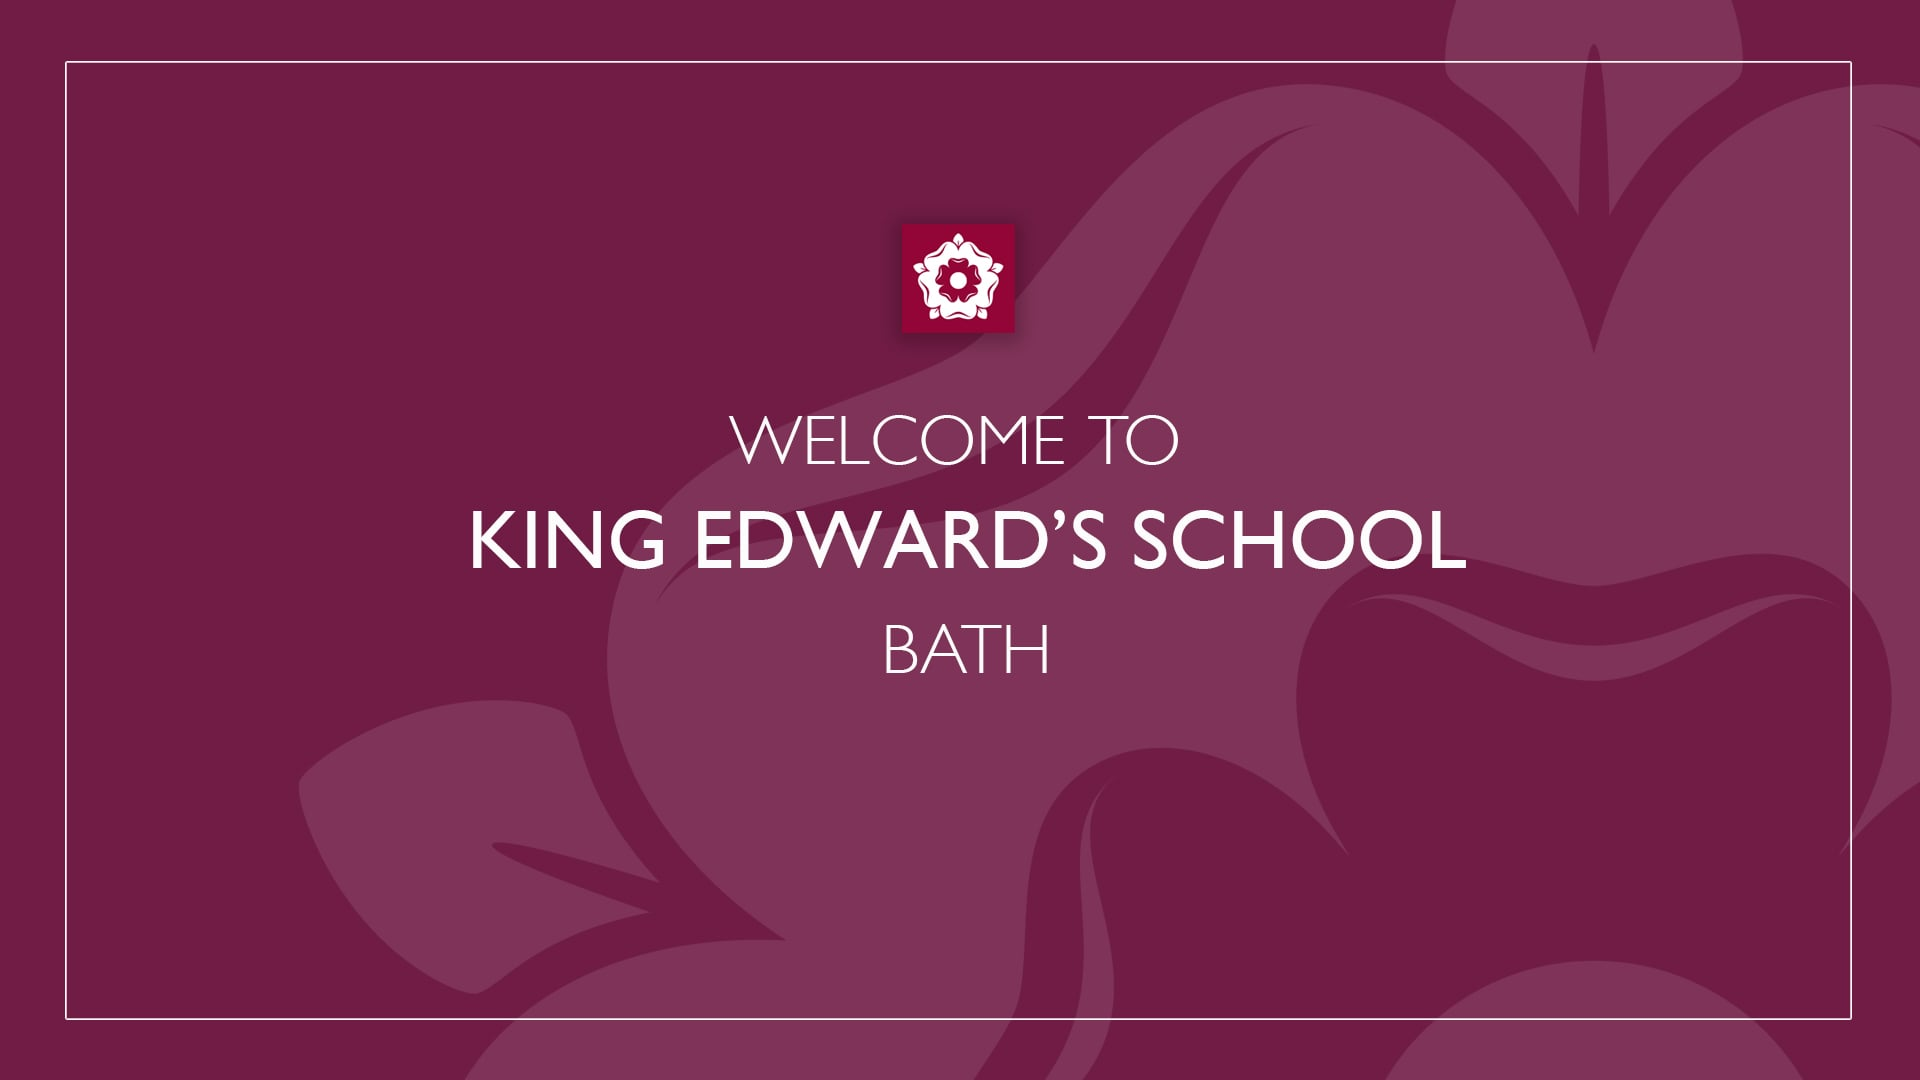 King Edward's School Virtual Welcome